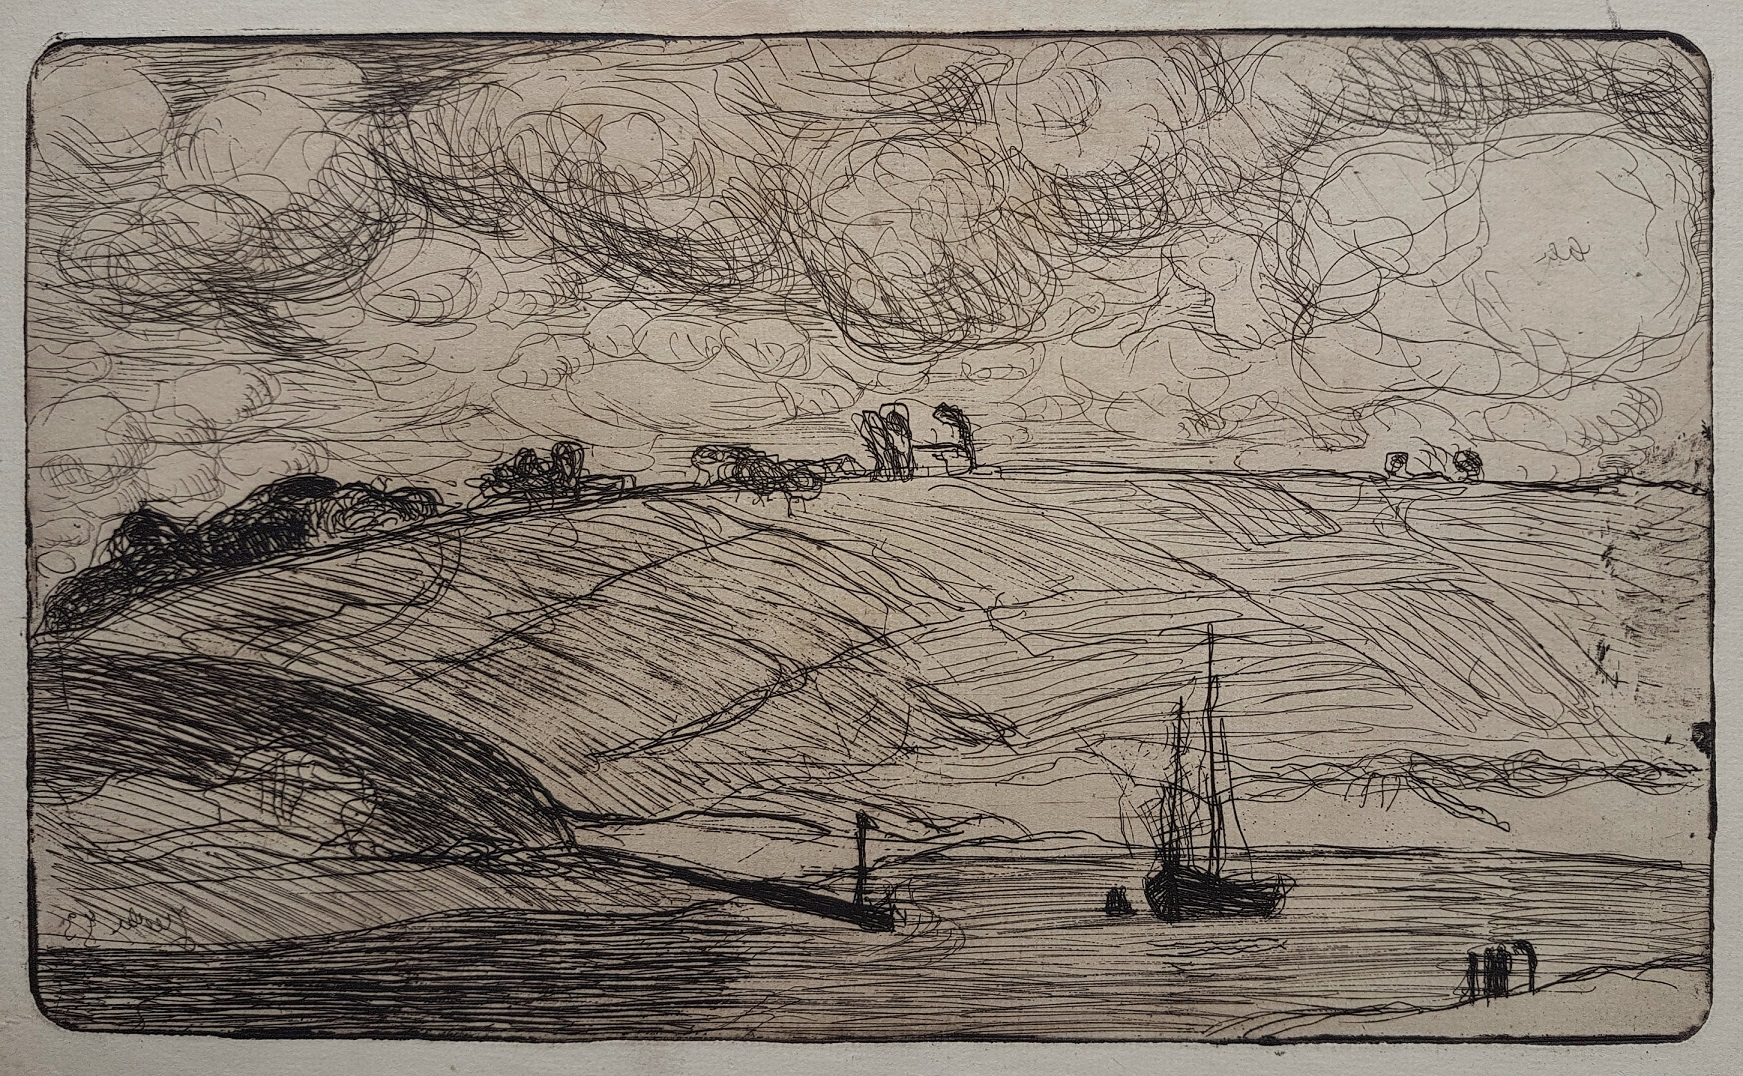 L'entrée De La Rivière [the Mooring] by Armand Seguin